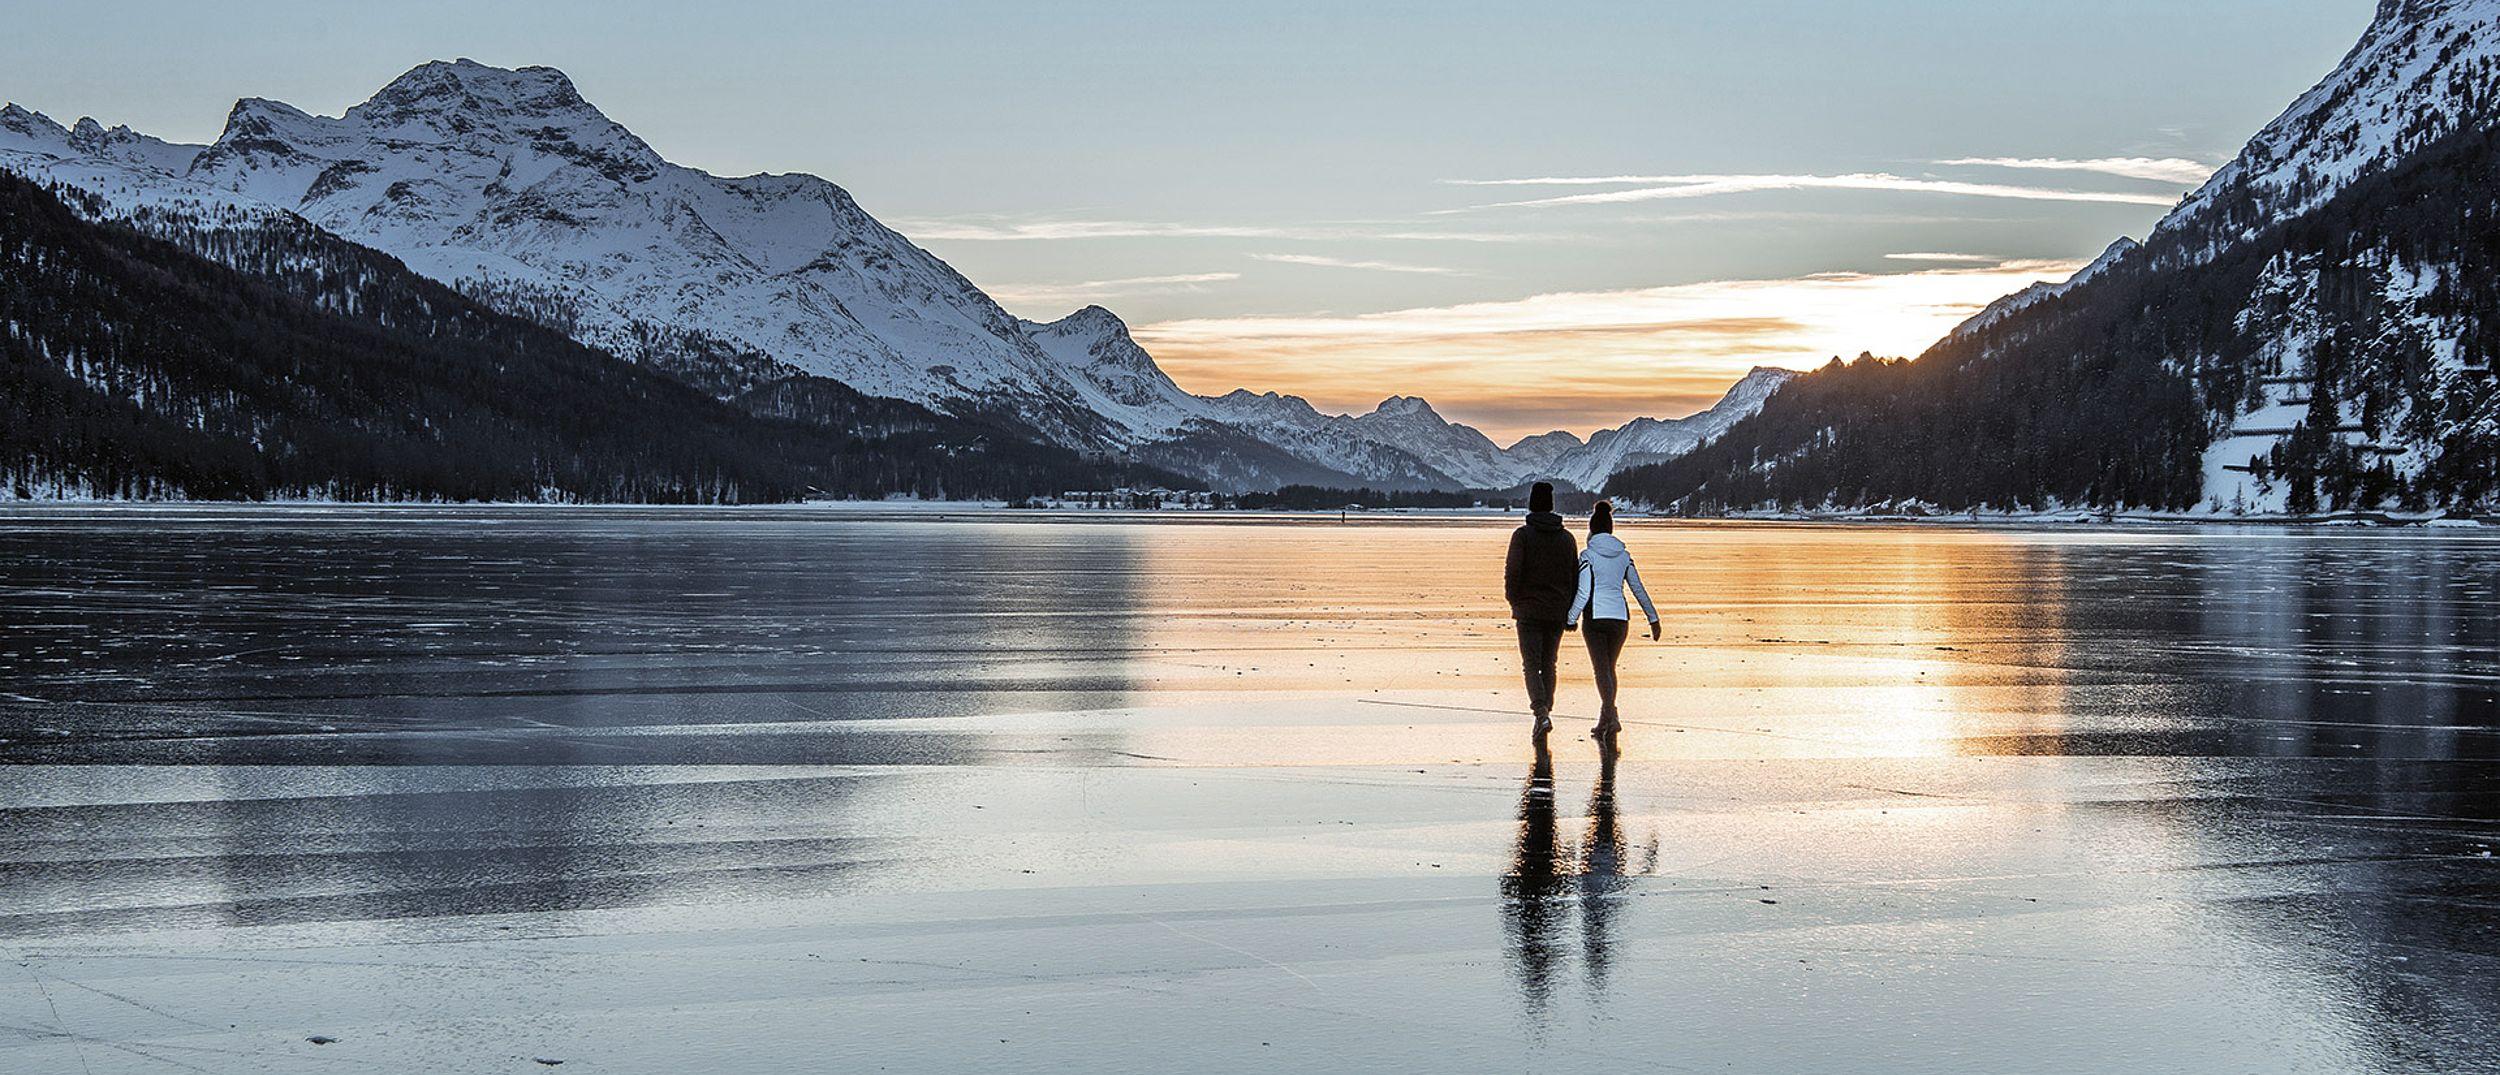 Winter Hiking on the Lake St. Moritz